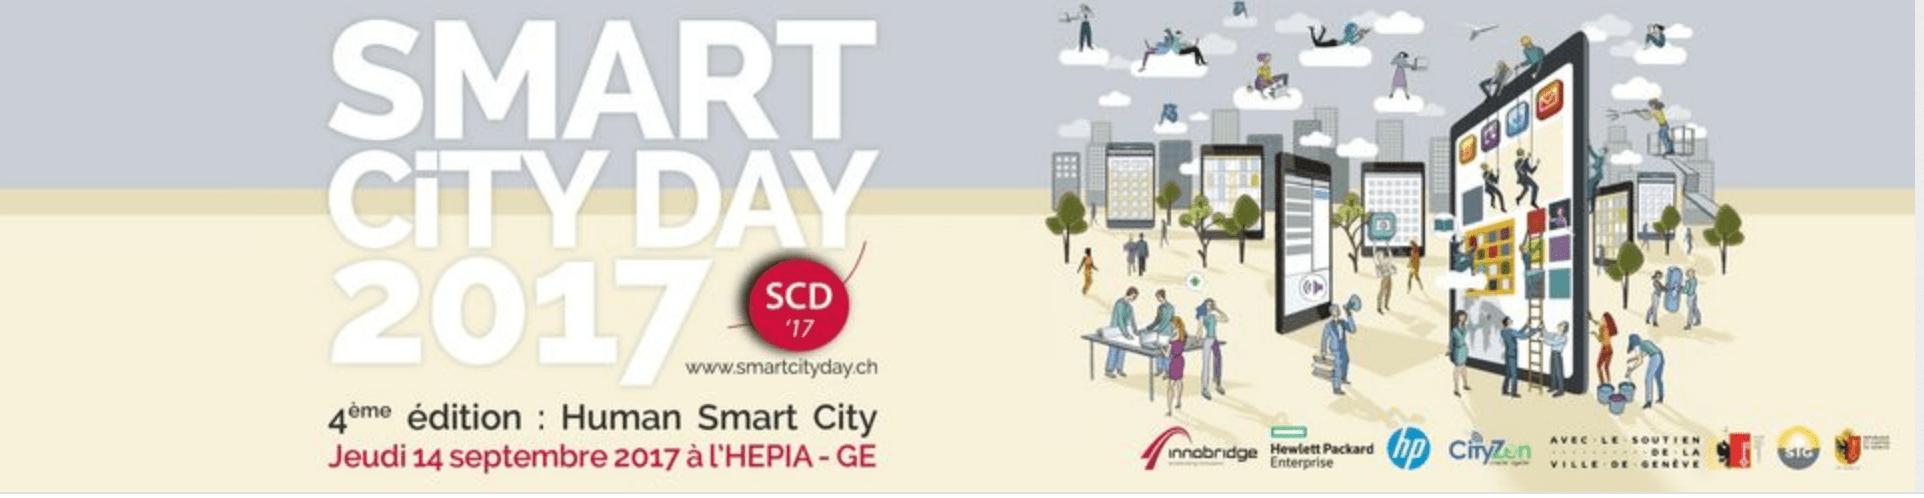 Logo: Smart City Day